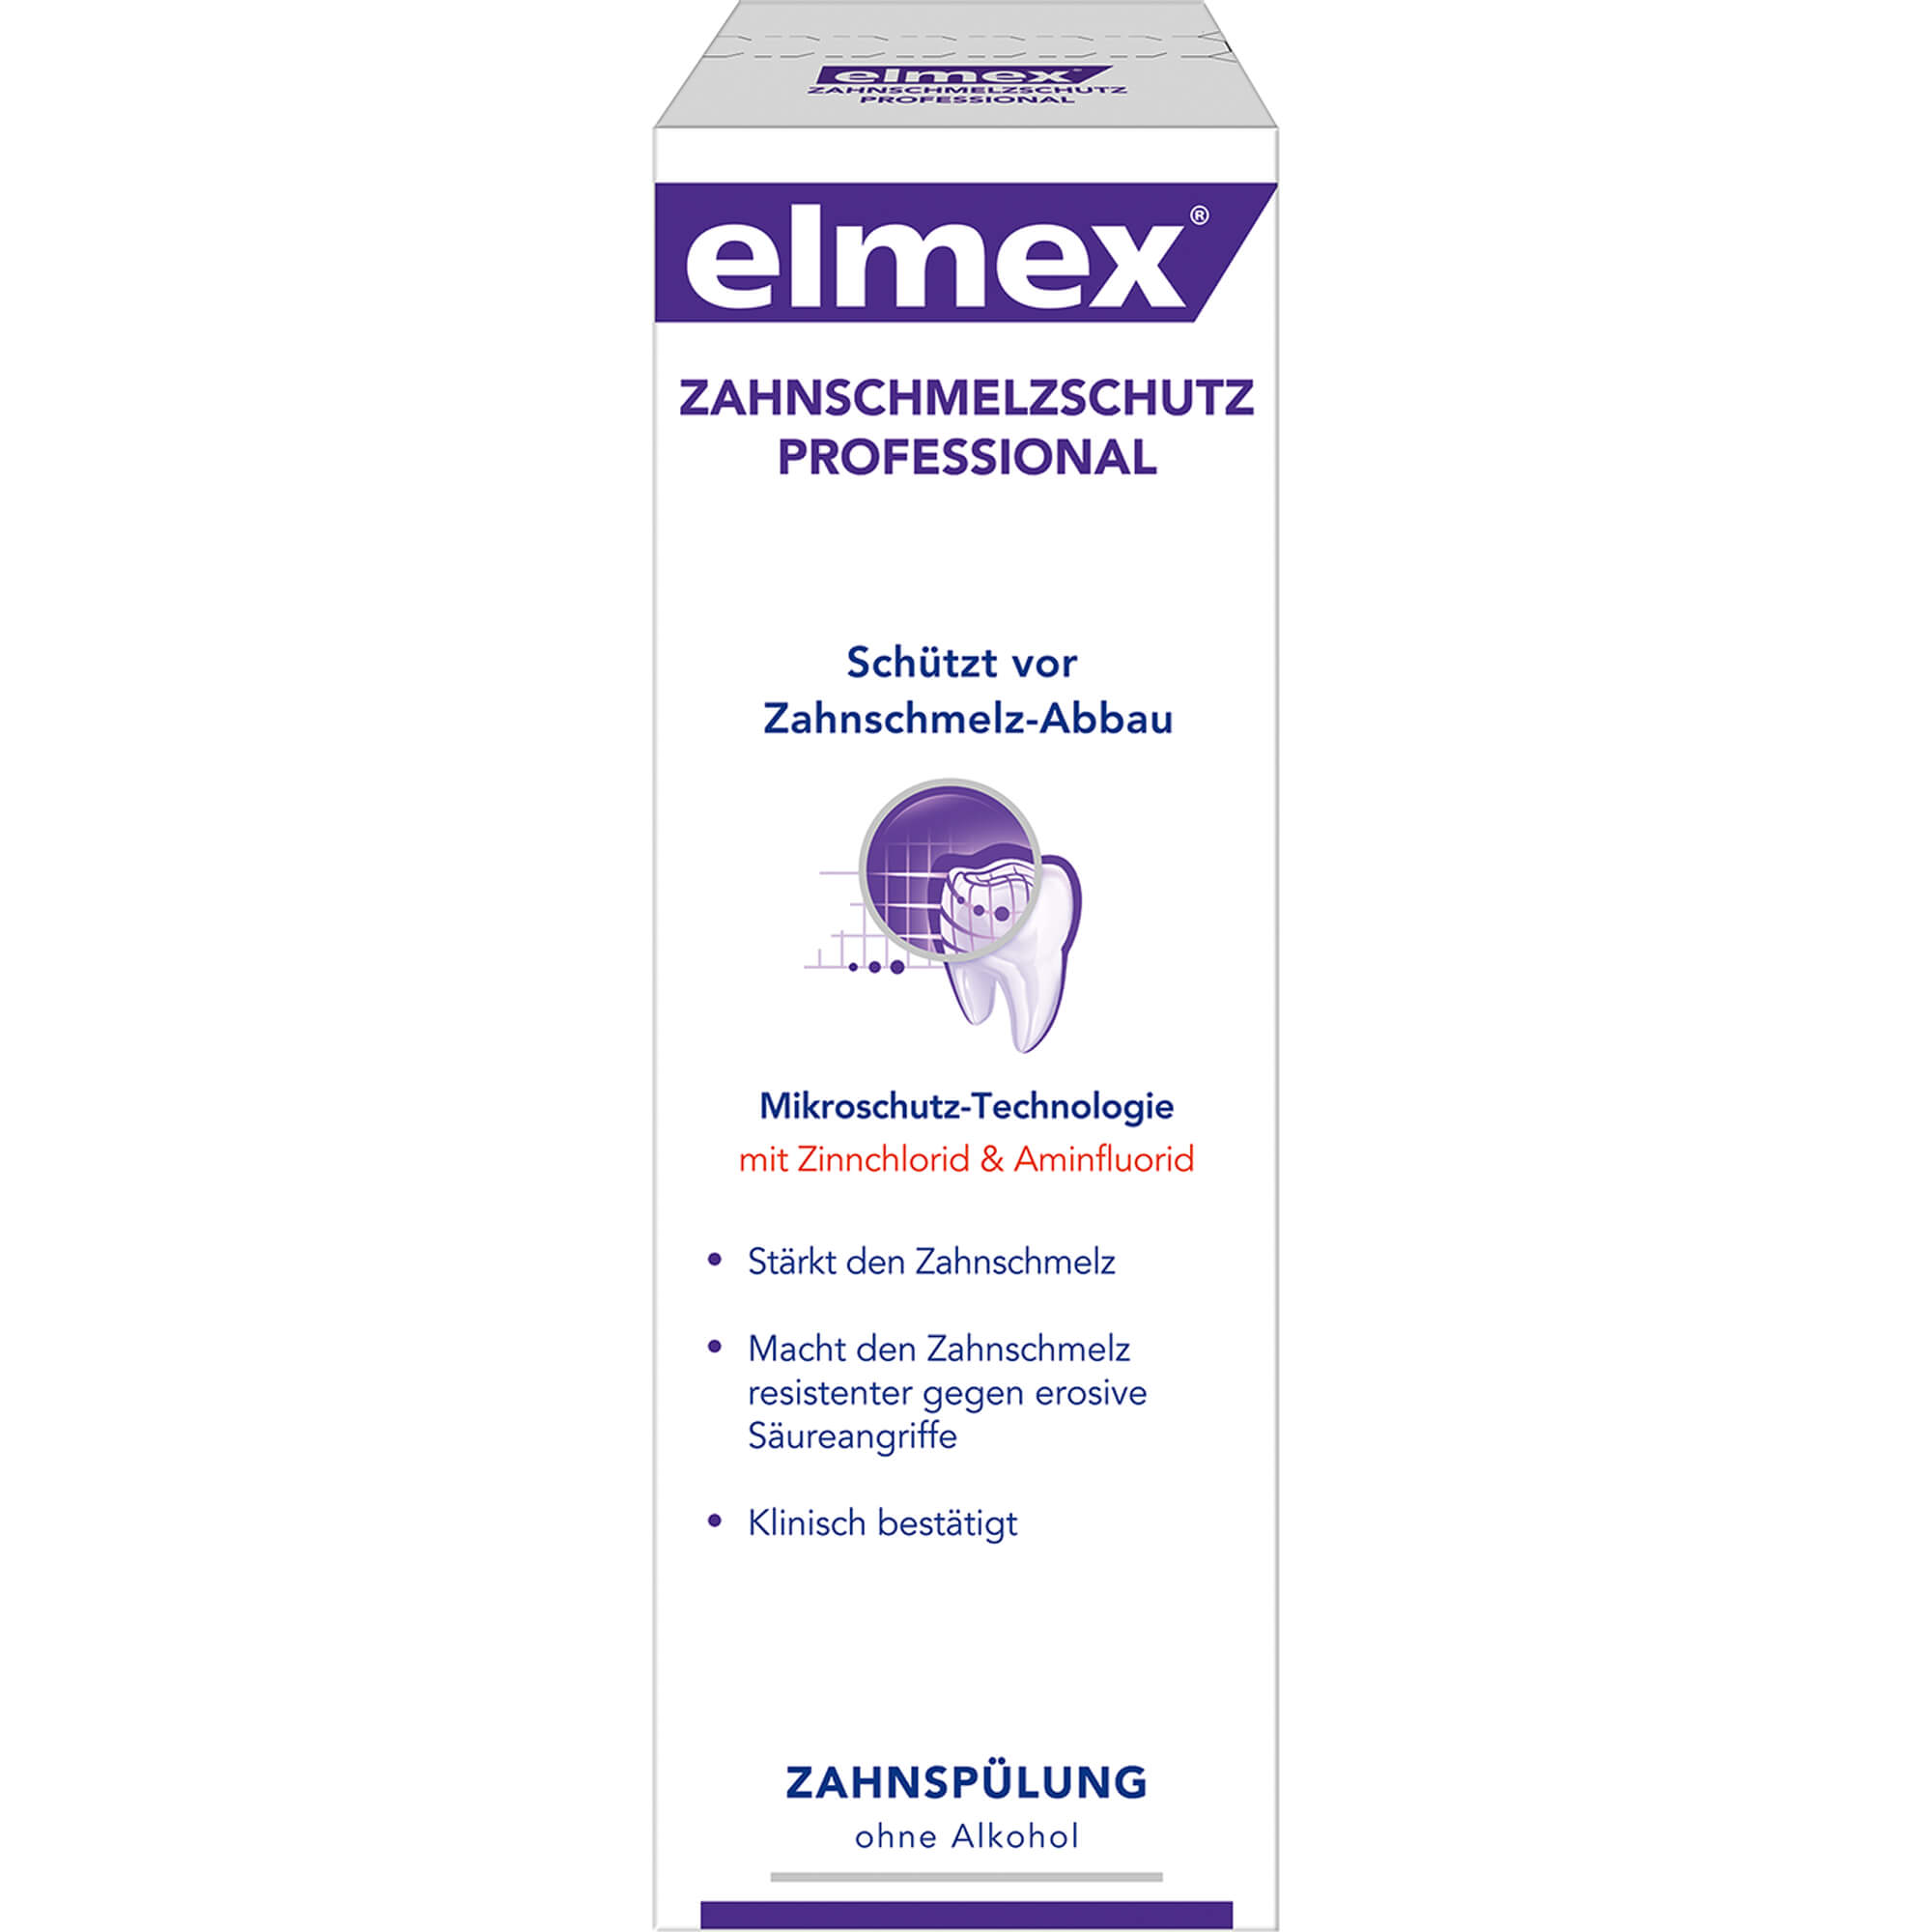 ELMEX-Zahnschmelzschutz-PROFESSIONAL-Zahnspuelung